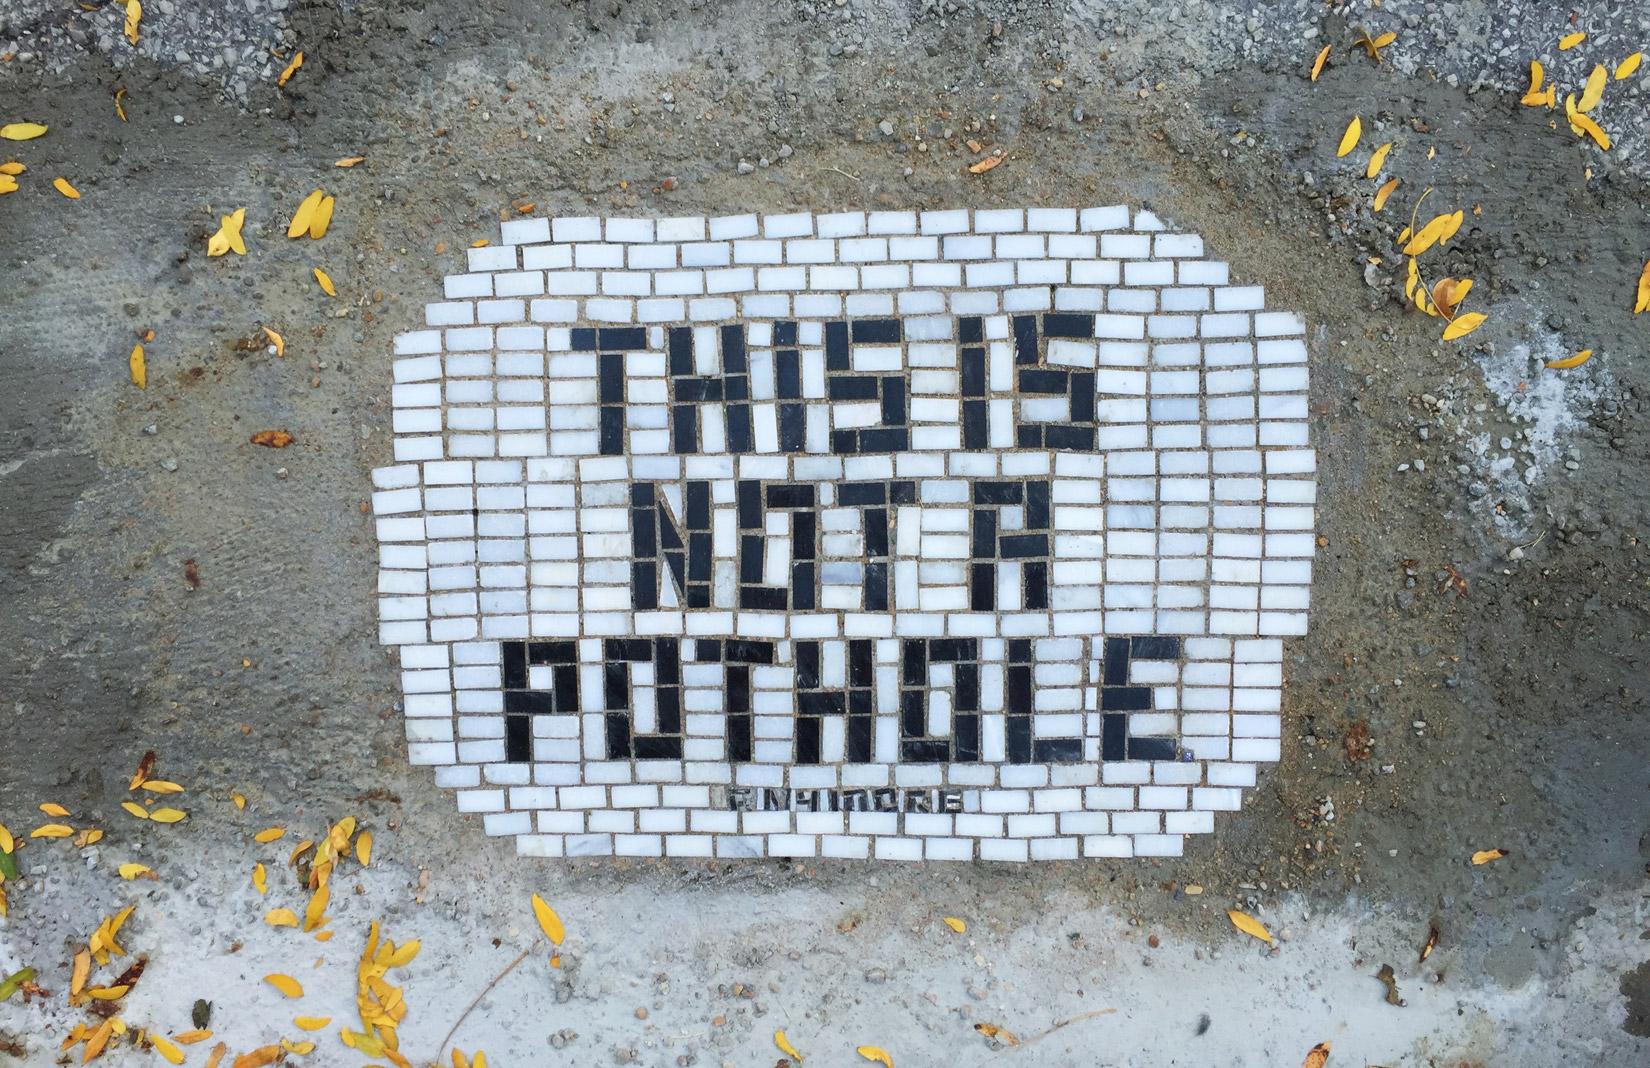 [Image: slogan-pothole-mosaic-by-Jim-Bachelor.jpg]